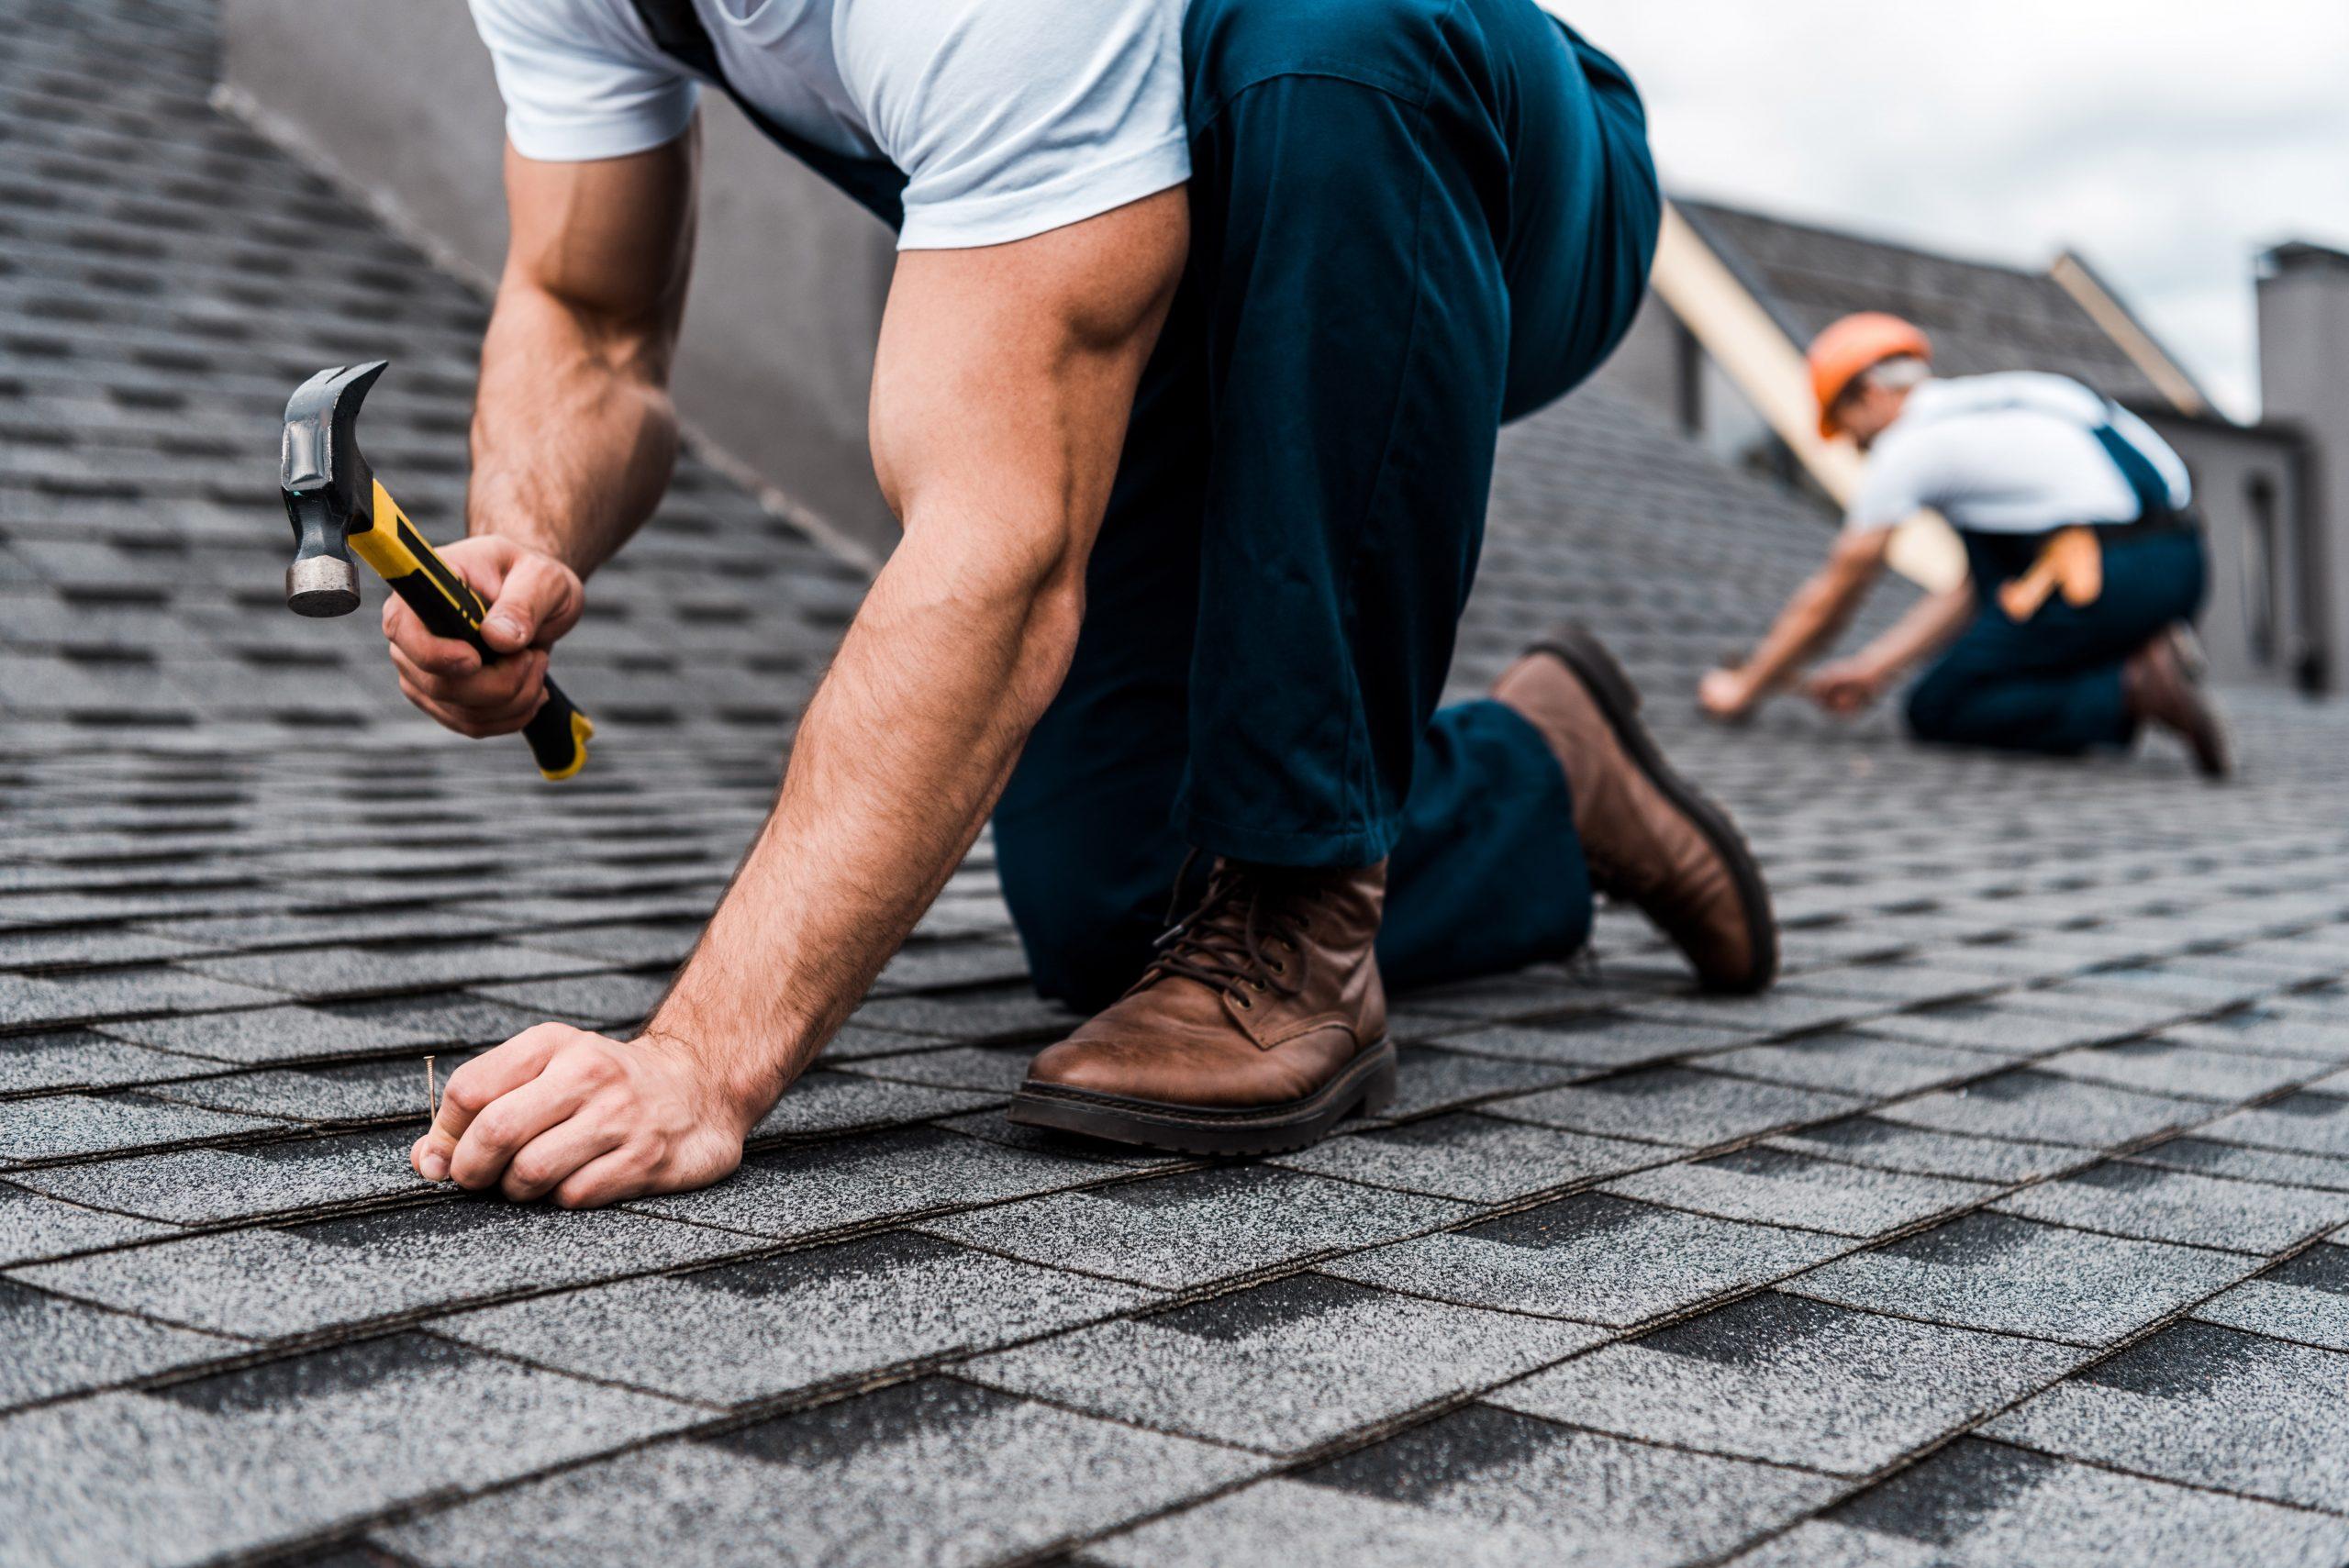 cropped view of repairmen in uniform working on rooftop